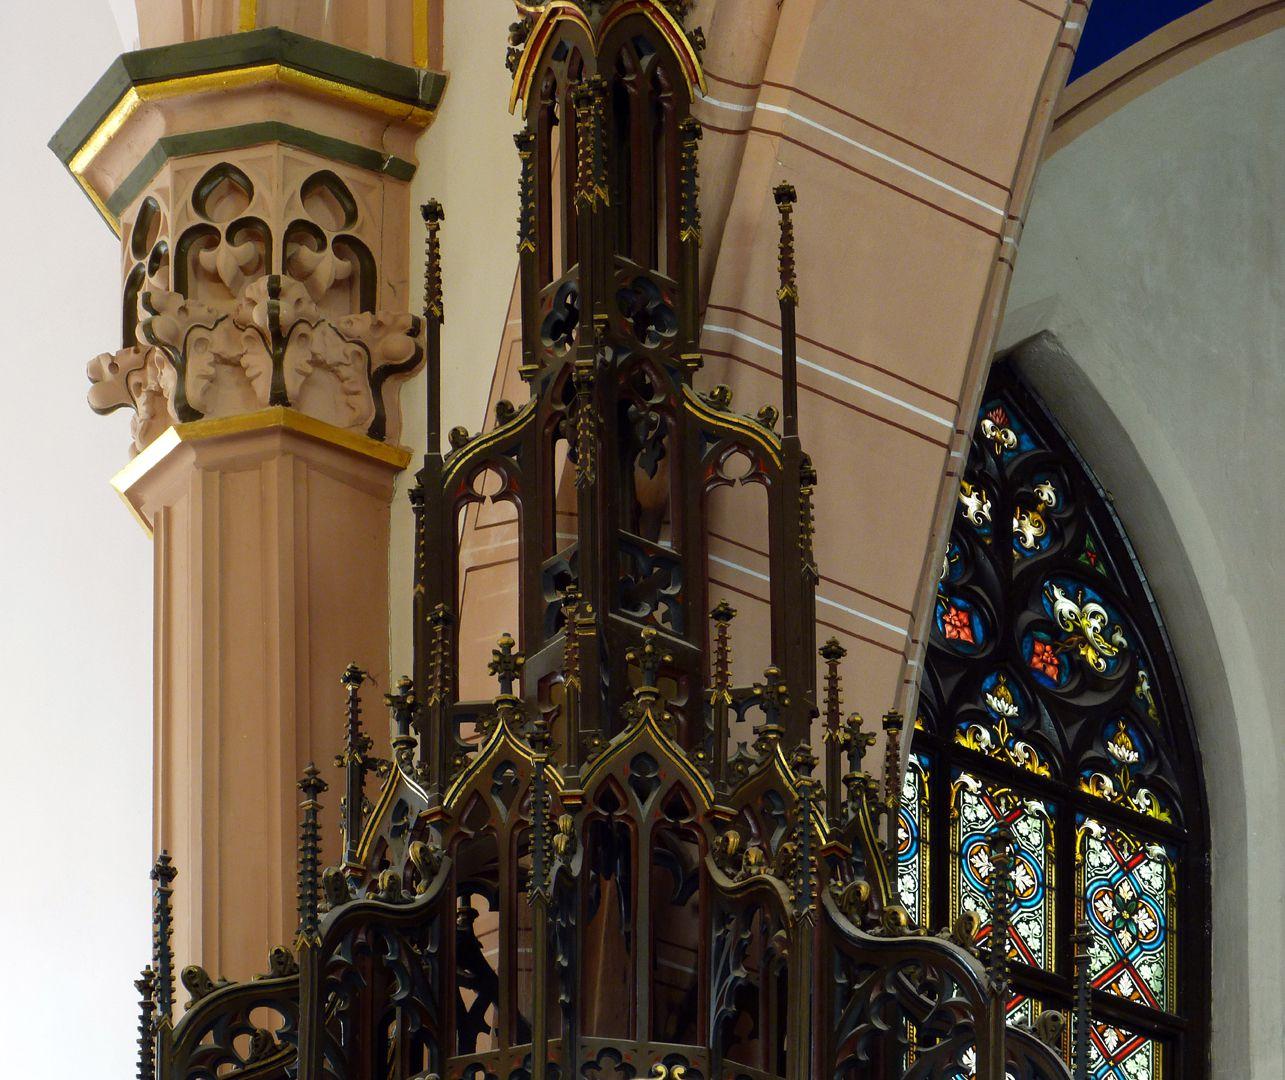 Parish Church St. Peter´s (Sonneberg) Upper part of the pulpit ceiling